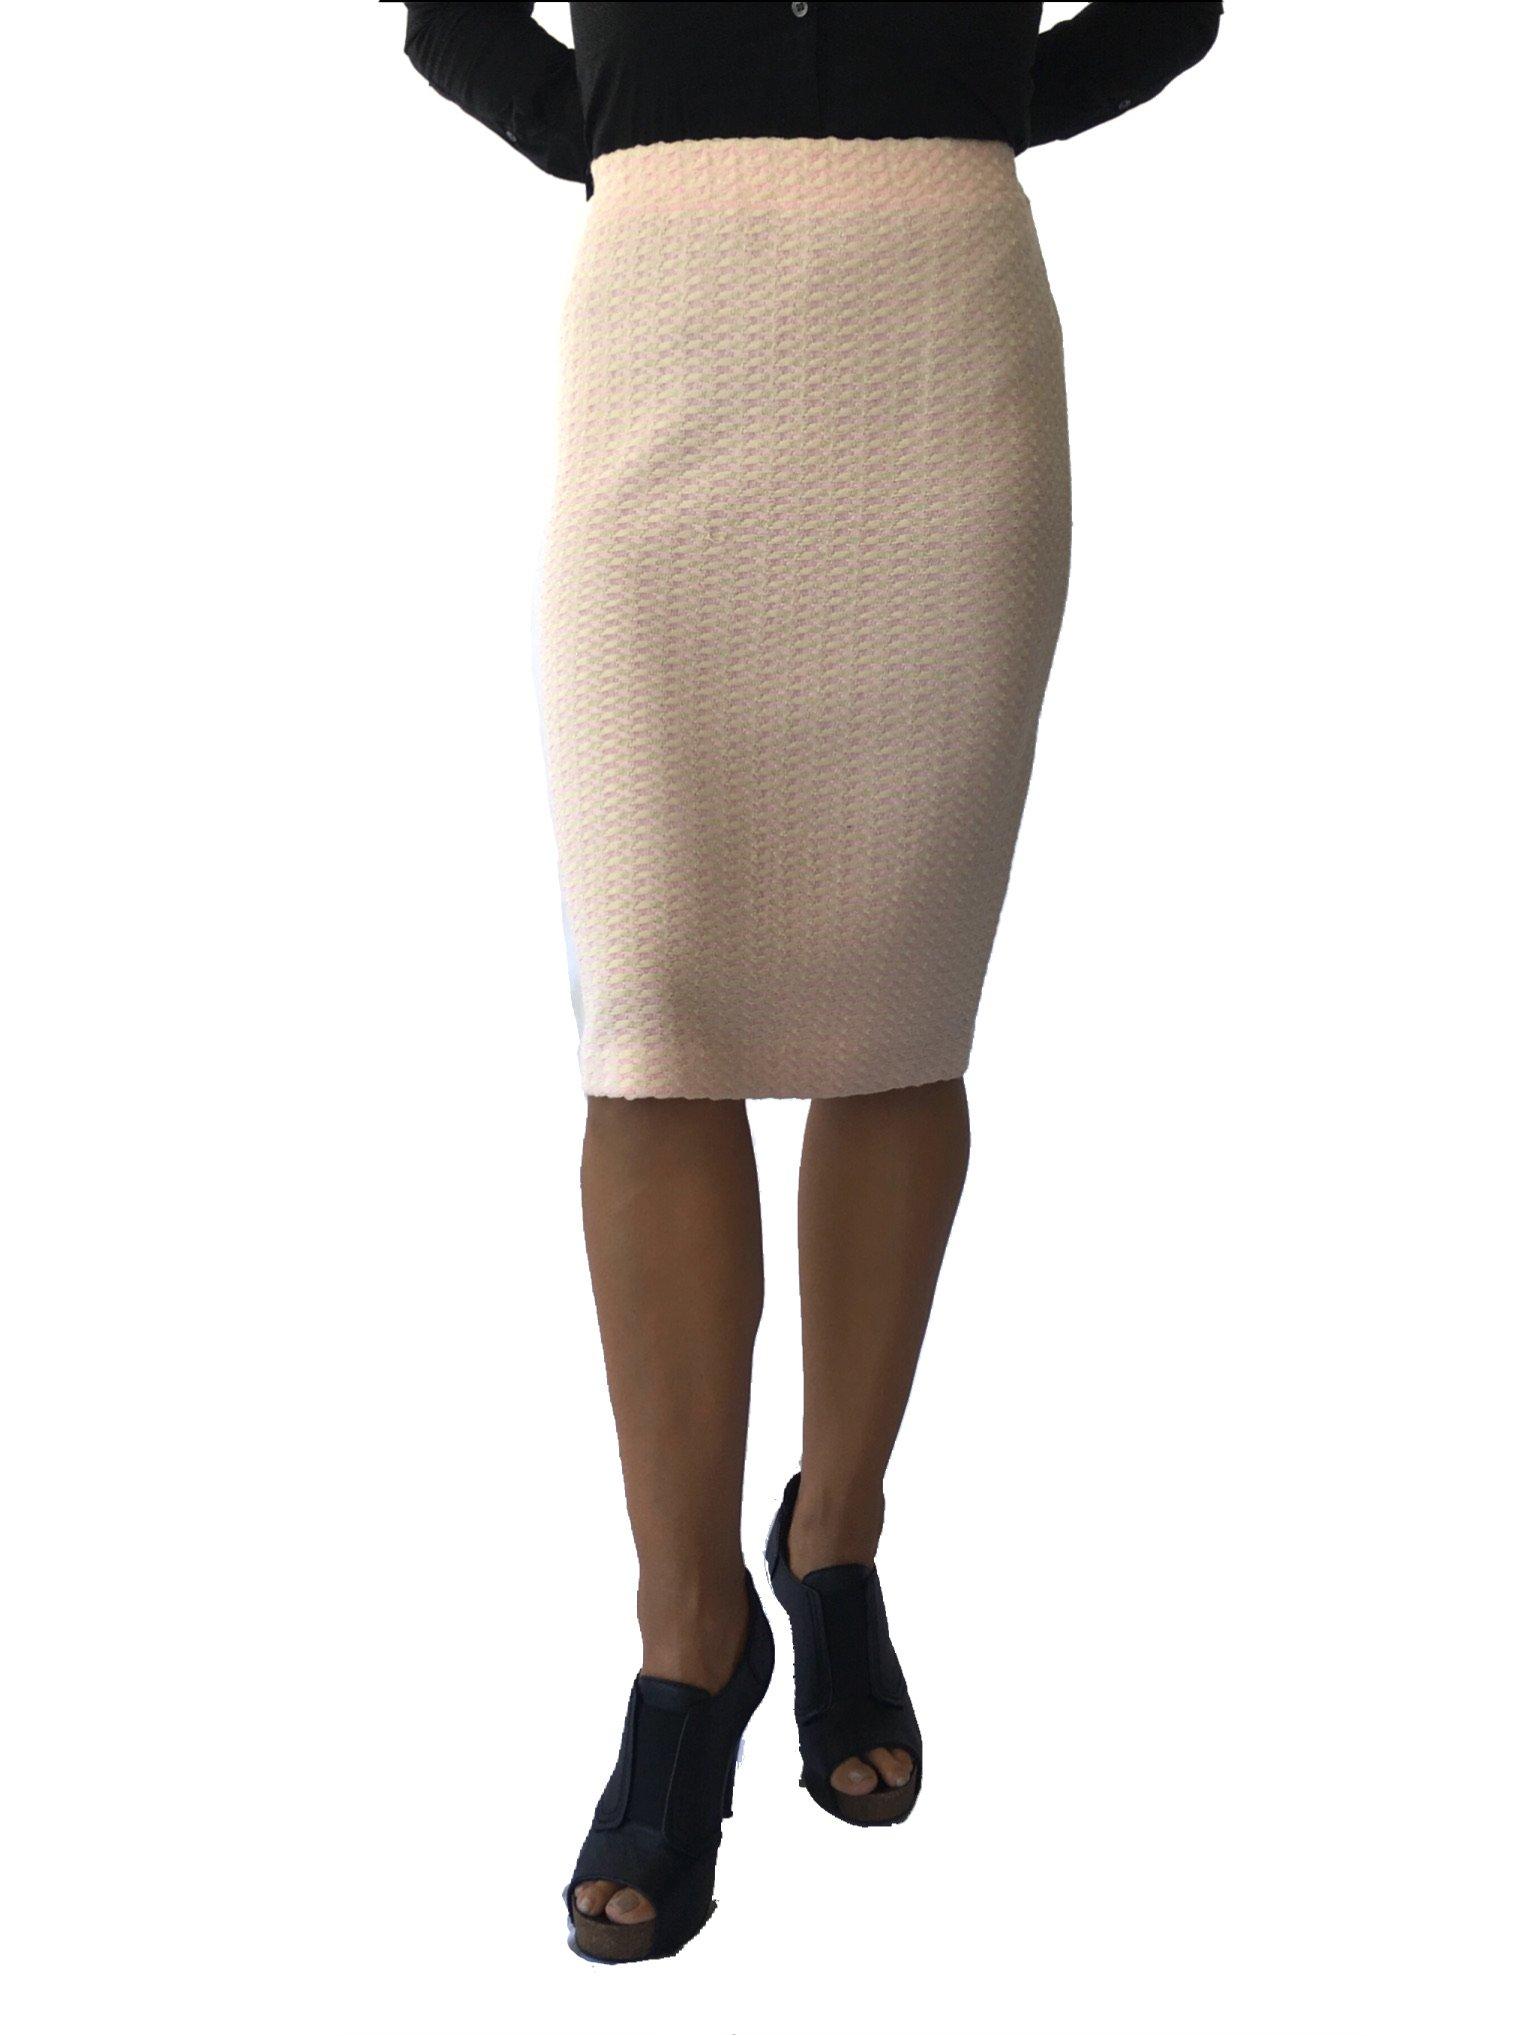 St. John Collection Tweed Knit Skirt (4, Lt.Pink/Khaki)